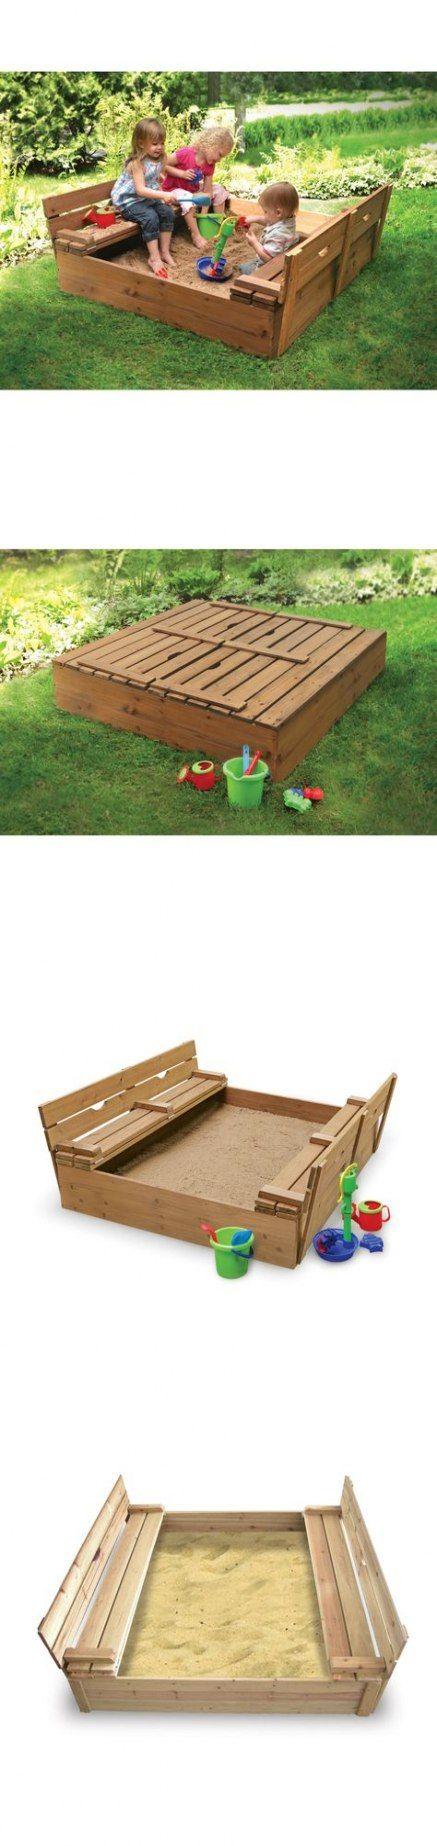 Backyard Swing Set Sandbox 53+ Ideas #backyard | Backyard ...